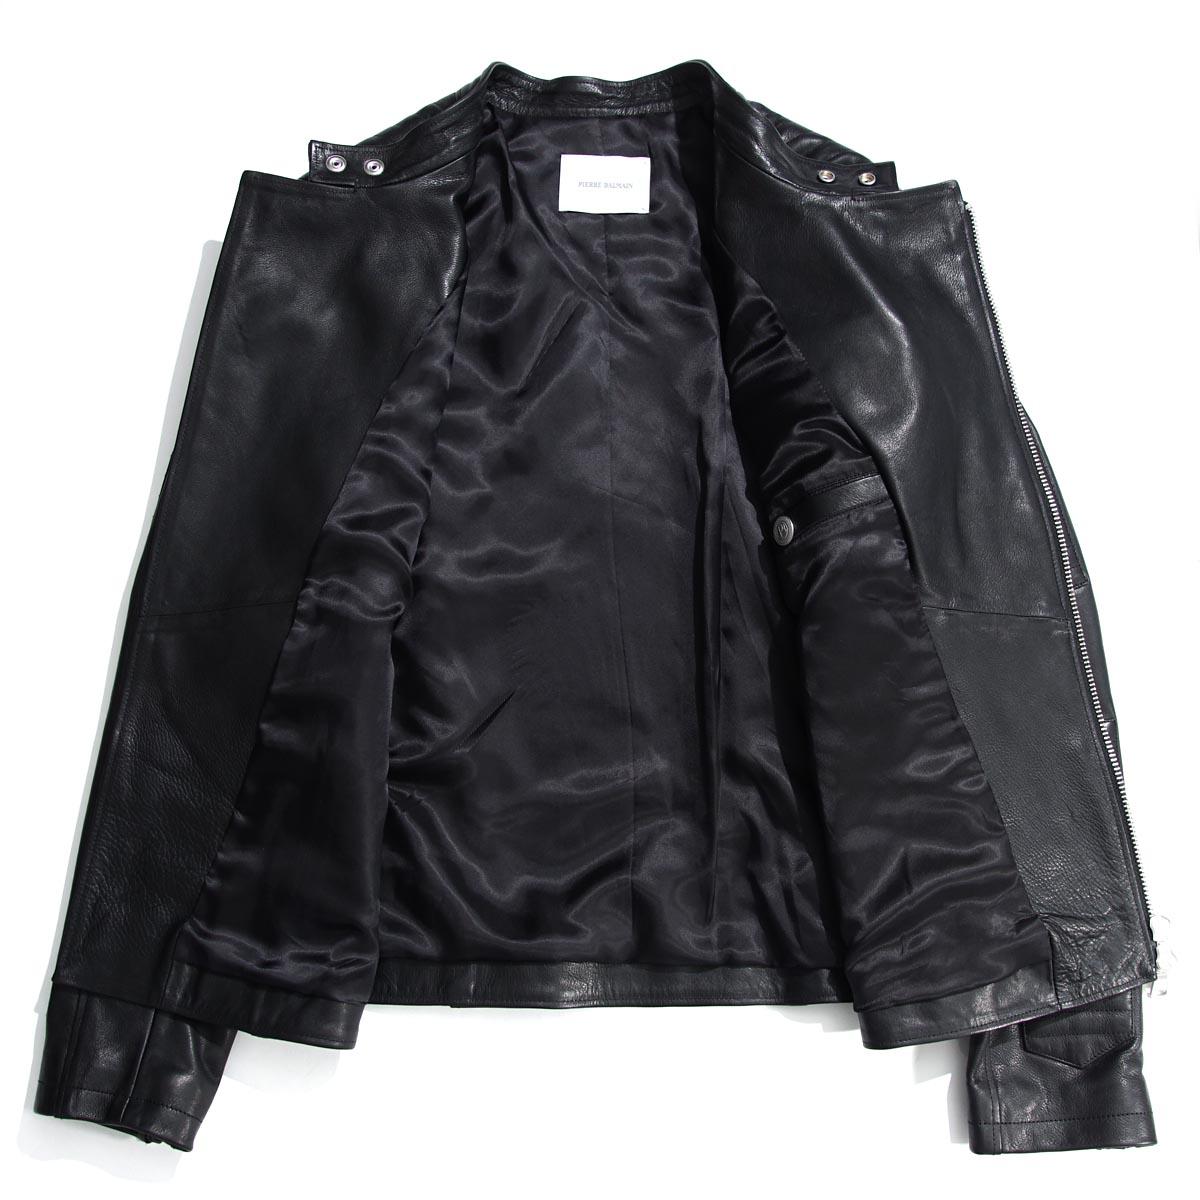 pierubaruman PIERRE BALMAIN骑手茄克LEATHER JACKET BLACK黑色派hp76039l a6016 905人